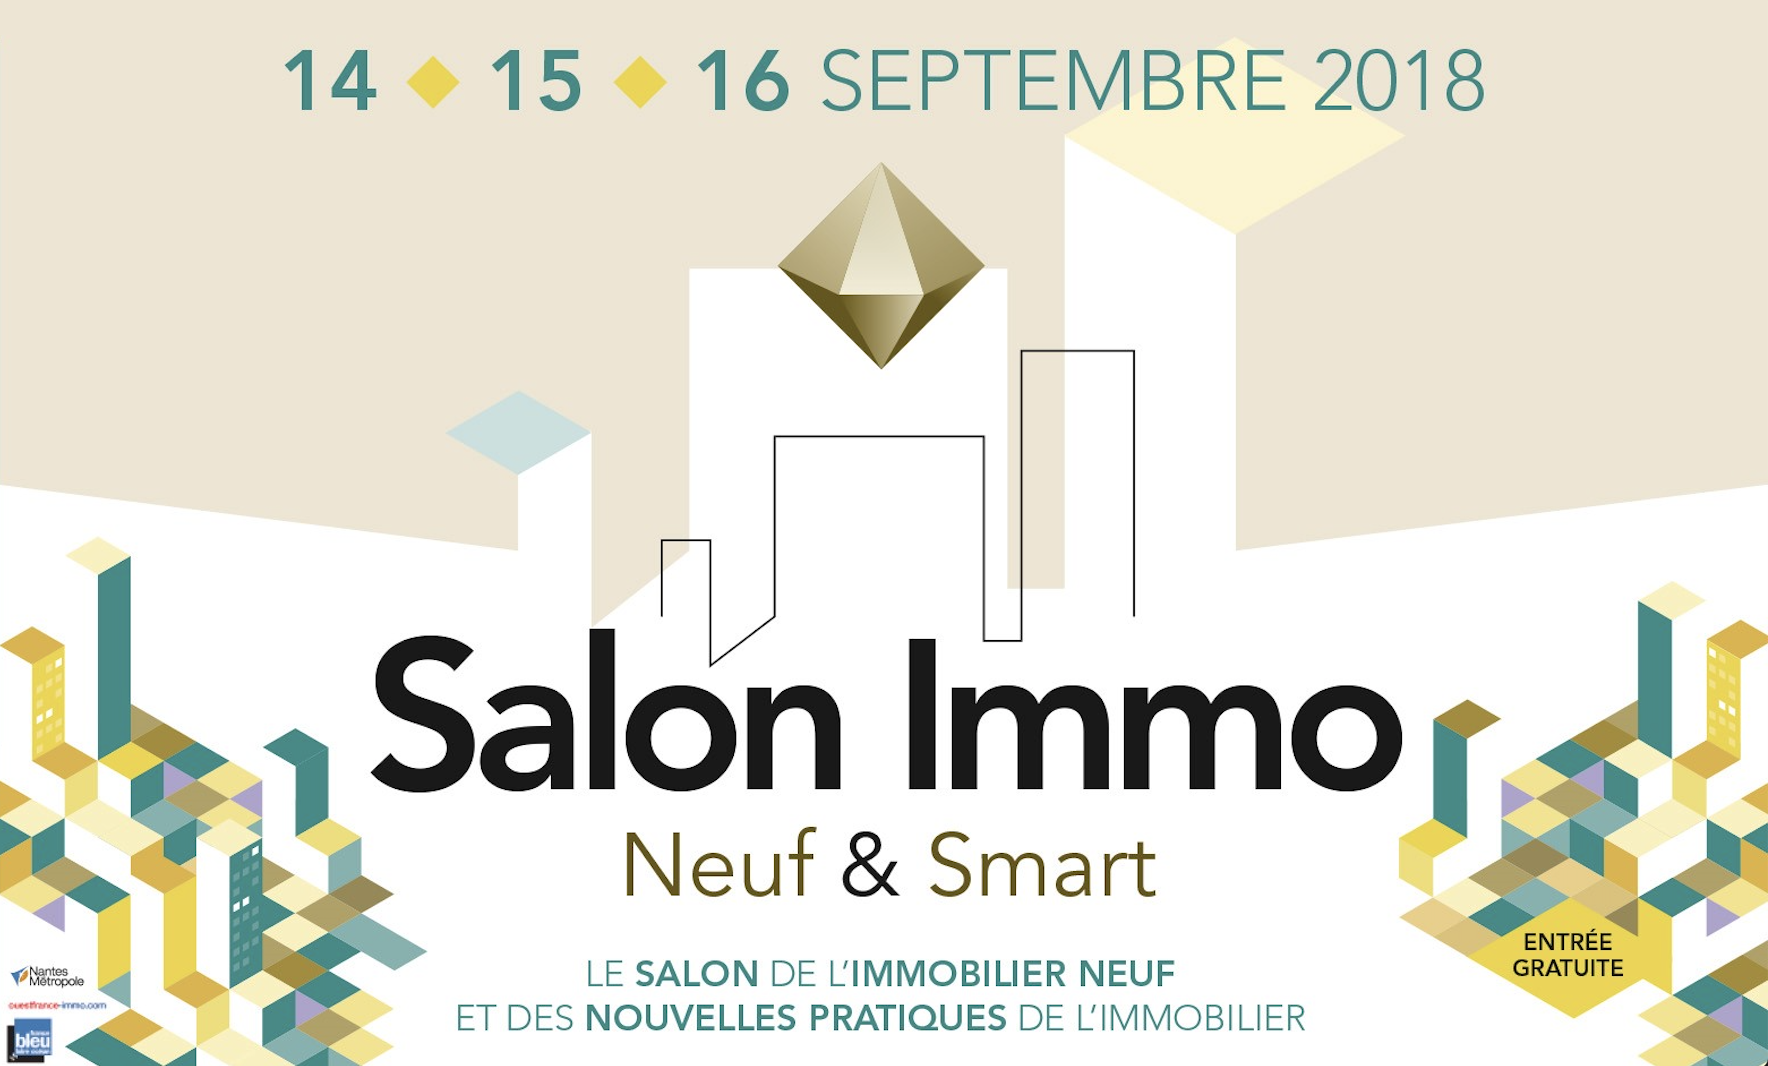 Le salon immo Neuf & Smart de Nantes